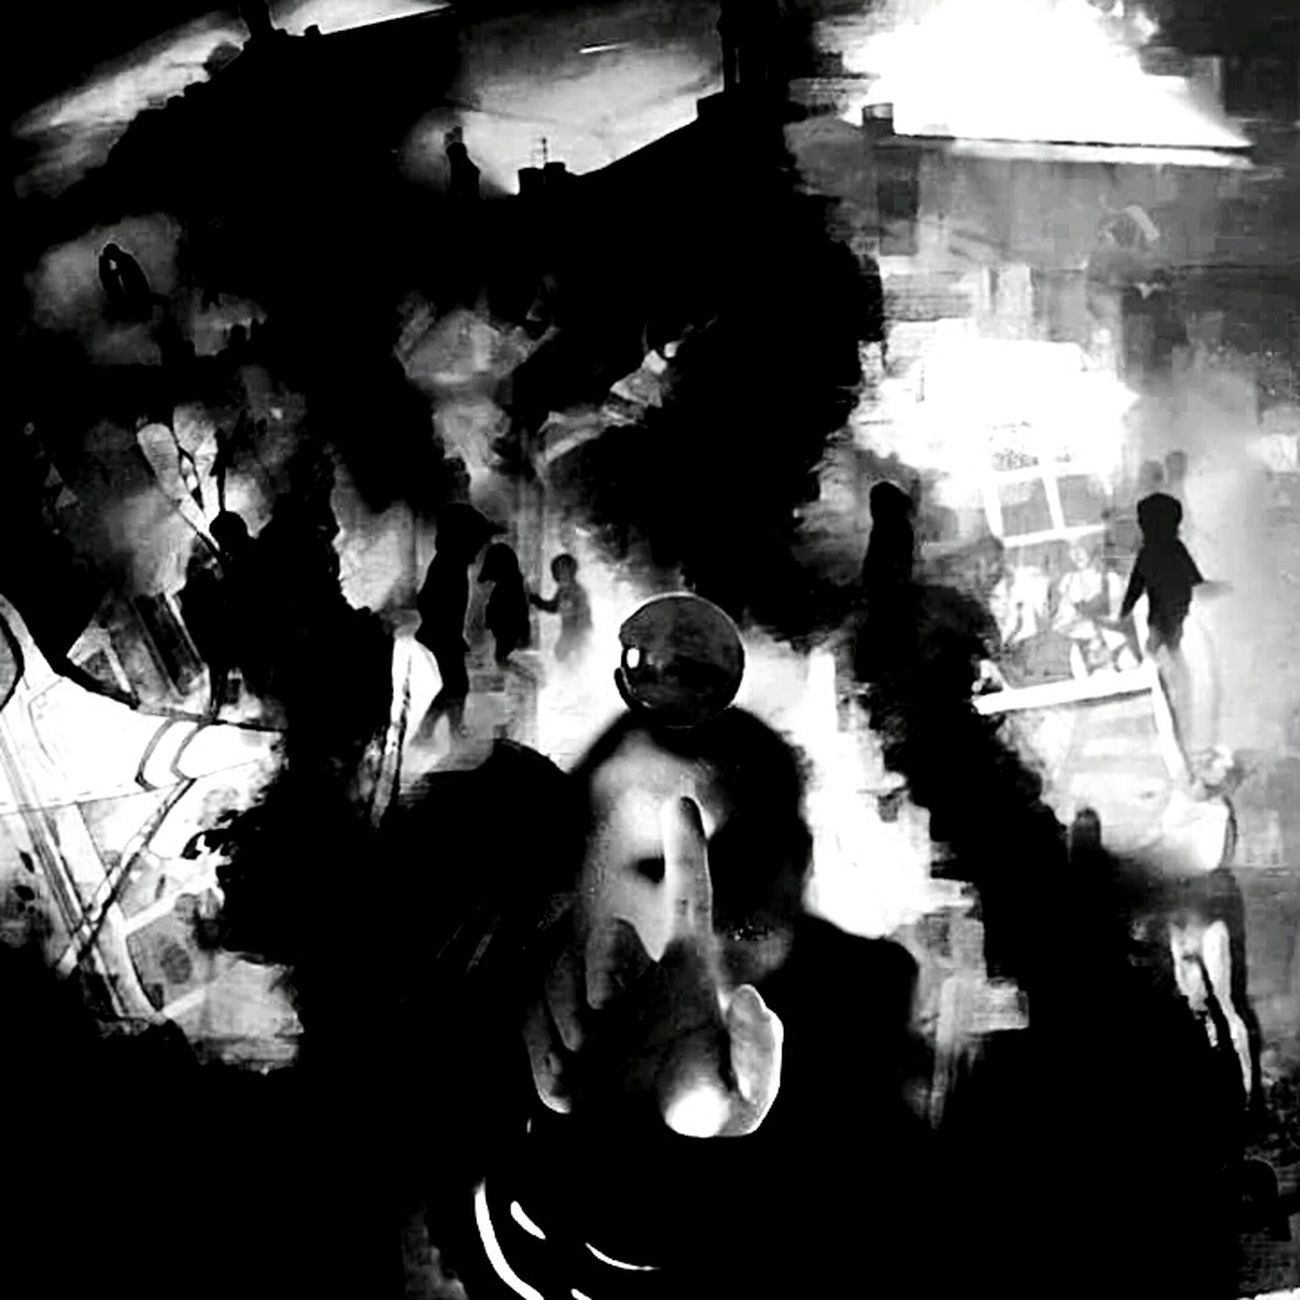 Shadow Freestyle Homma Bulla Variation A Un De Ces 4 Dark World What I Value Torch.Art